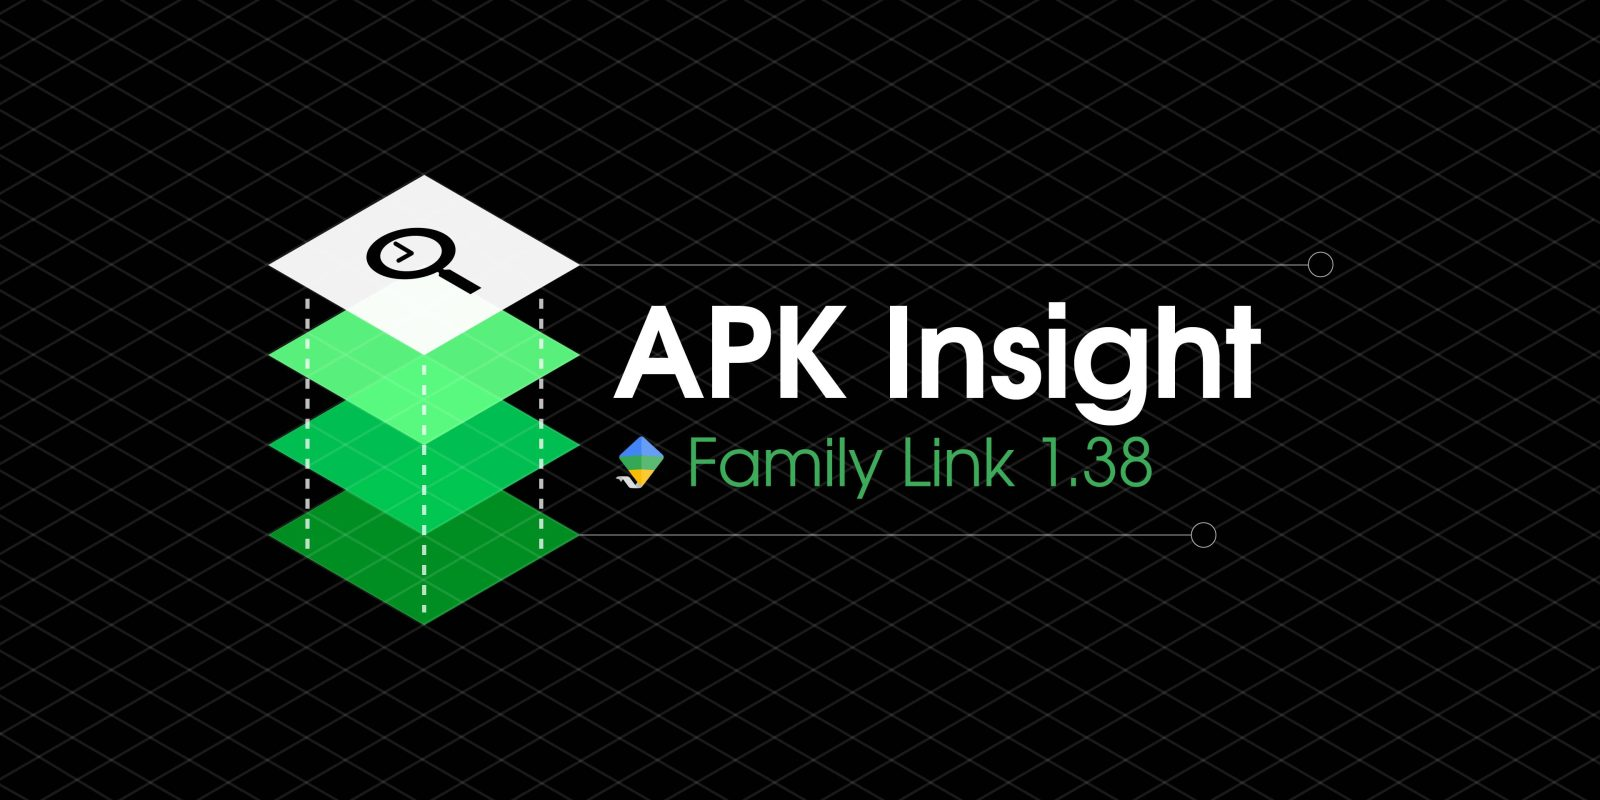 Family Link 1 38 preps parental controls for Google Stadia - 9to5Google